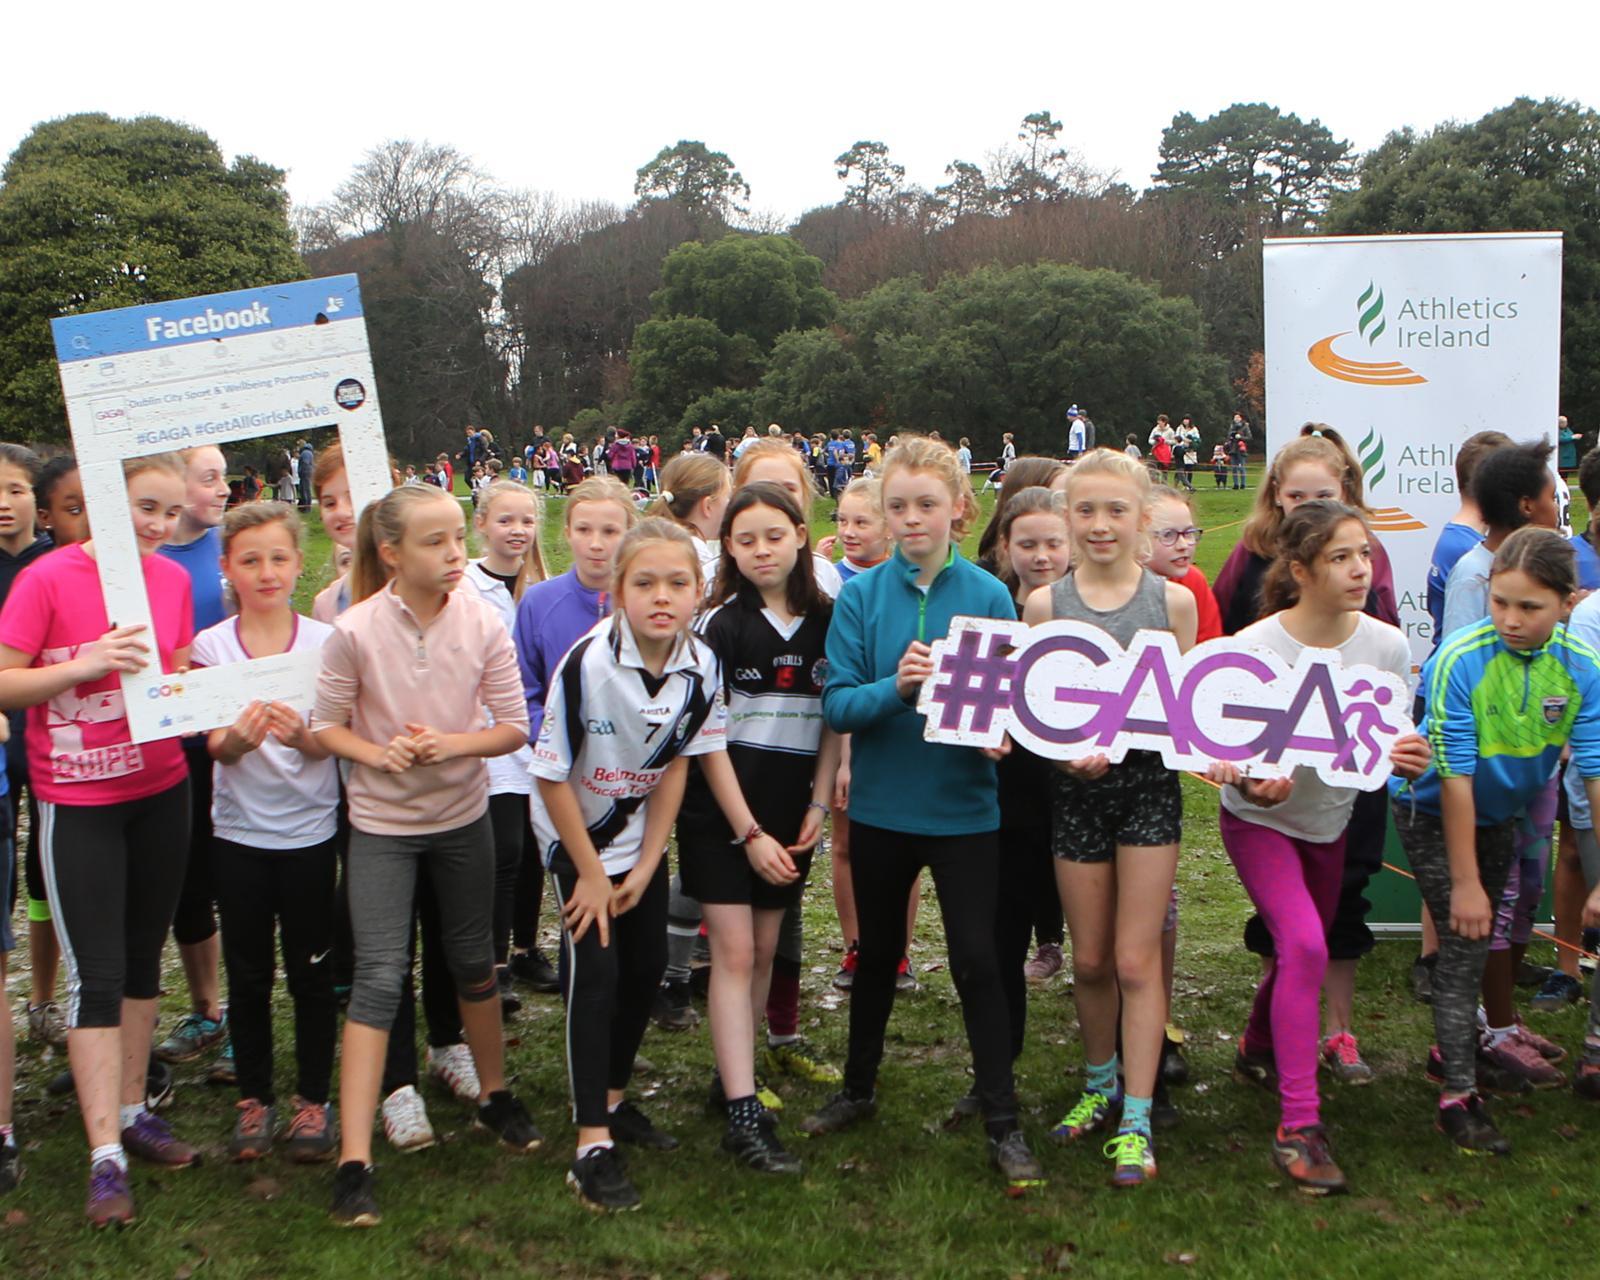 GAGA day initiative